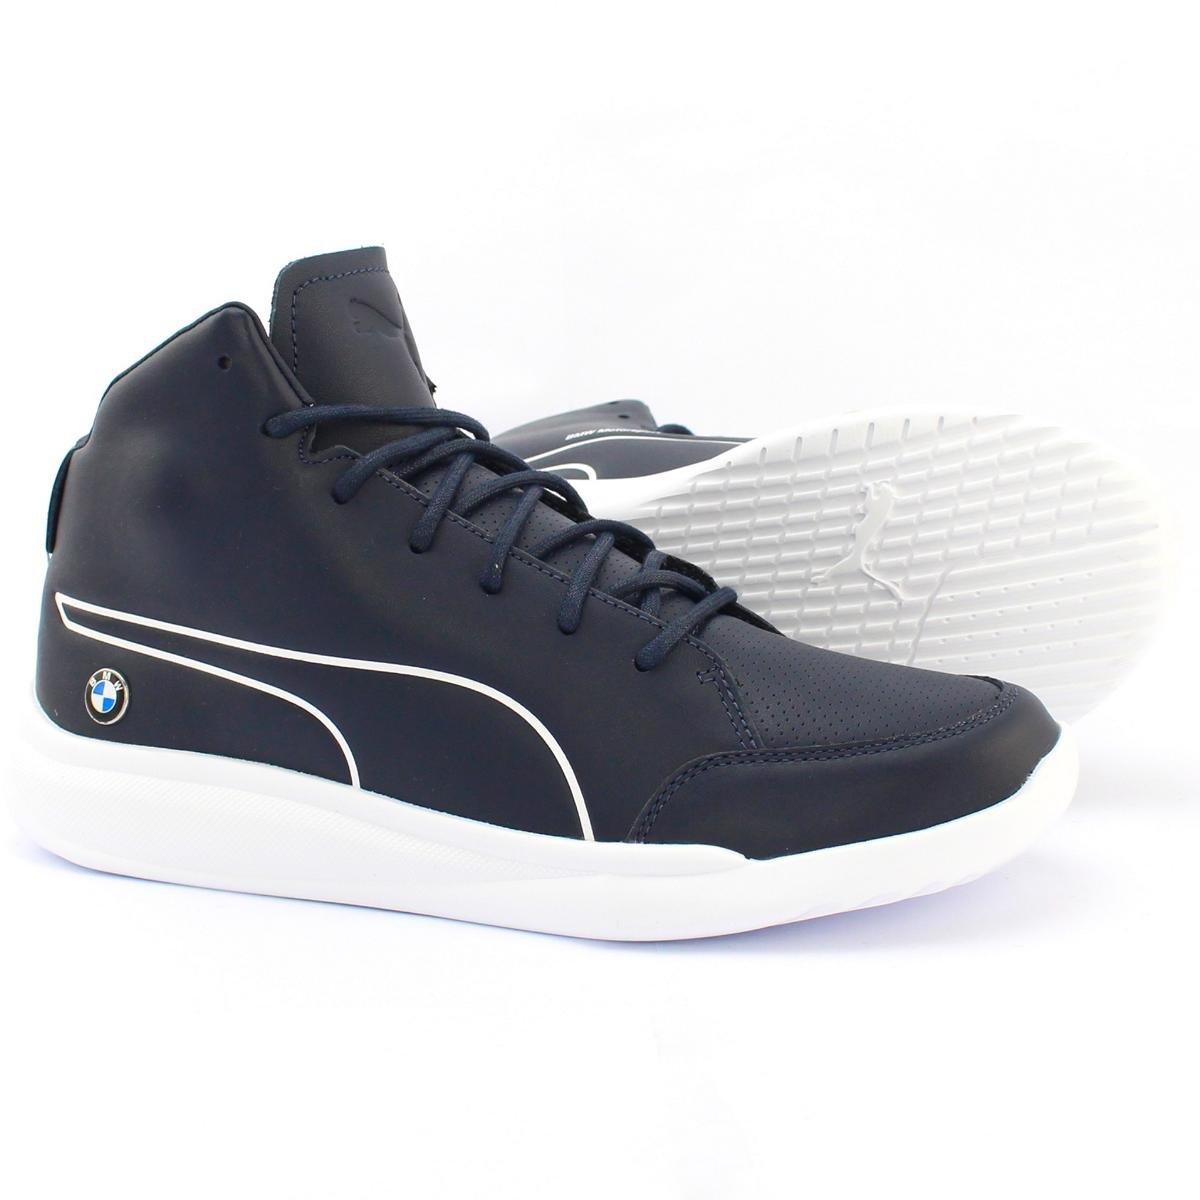 Puma BMW MS Casual Mid 305990 01 Motorsport Sneaker Hightop Schuhe